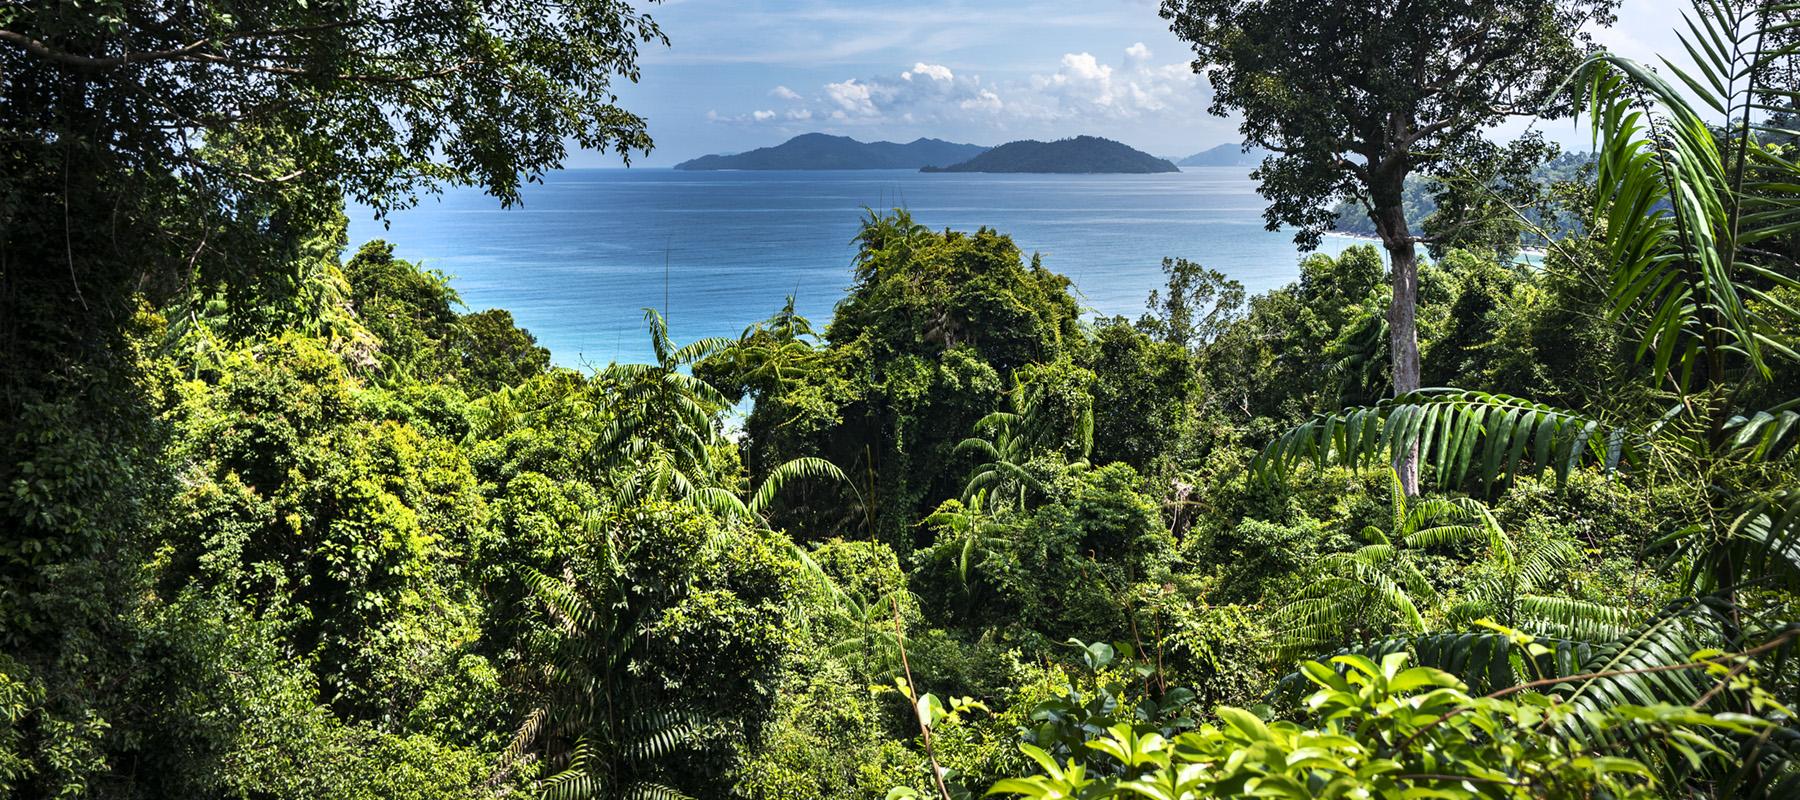 Malaysia_Borneo_Kinabatangan_